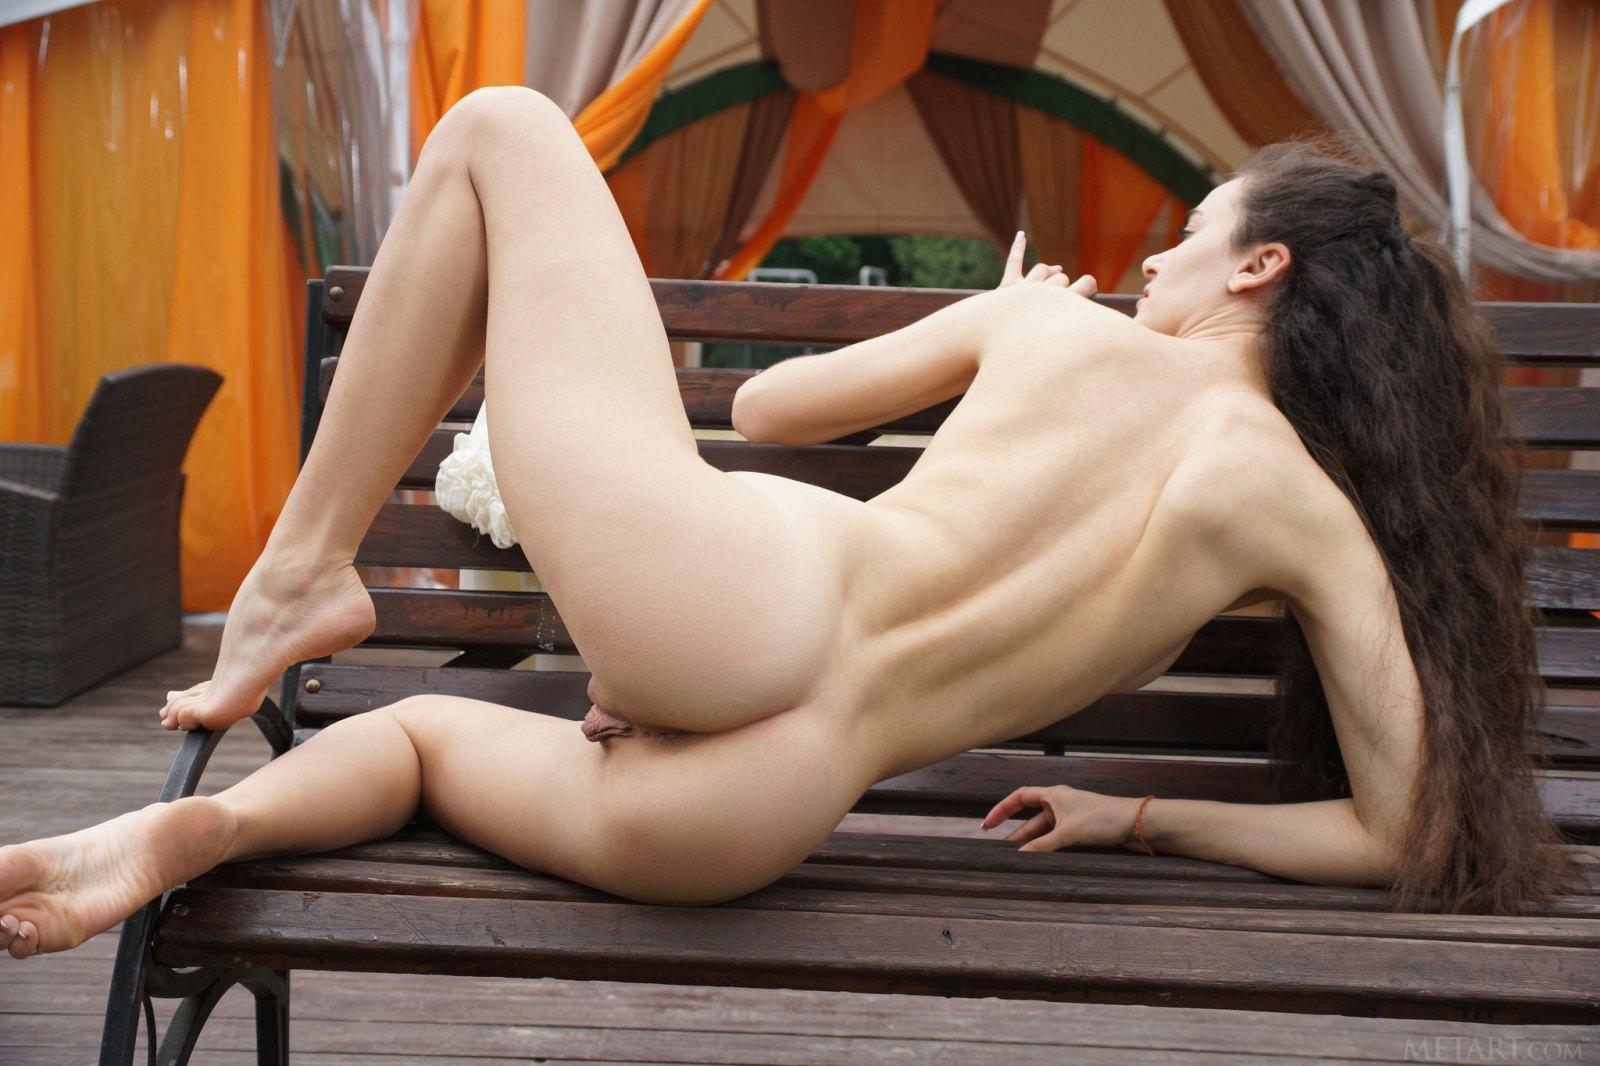 Wild girls naked